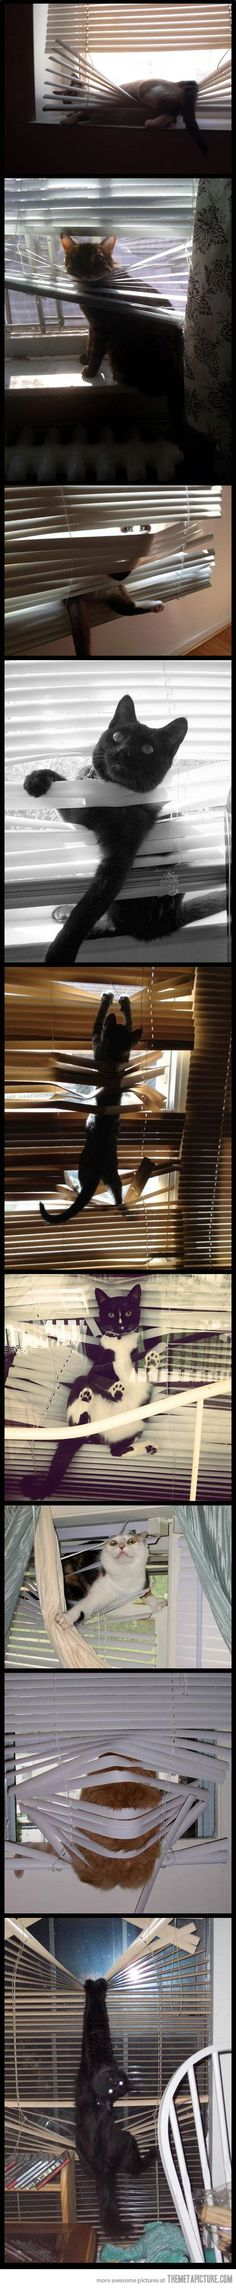 Cats vs. Blinds…